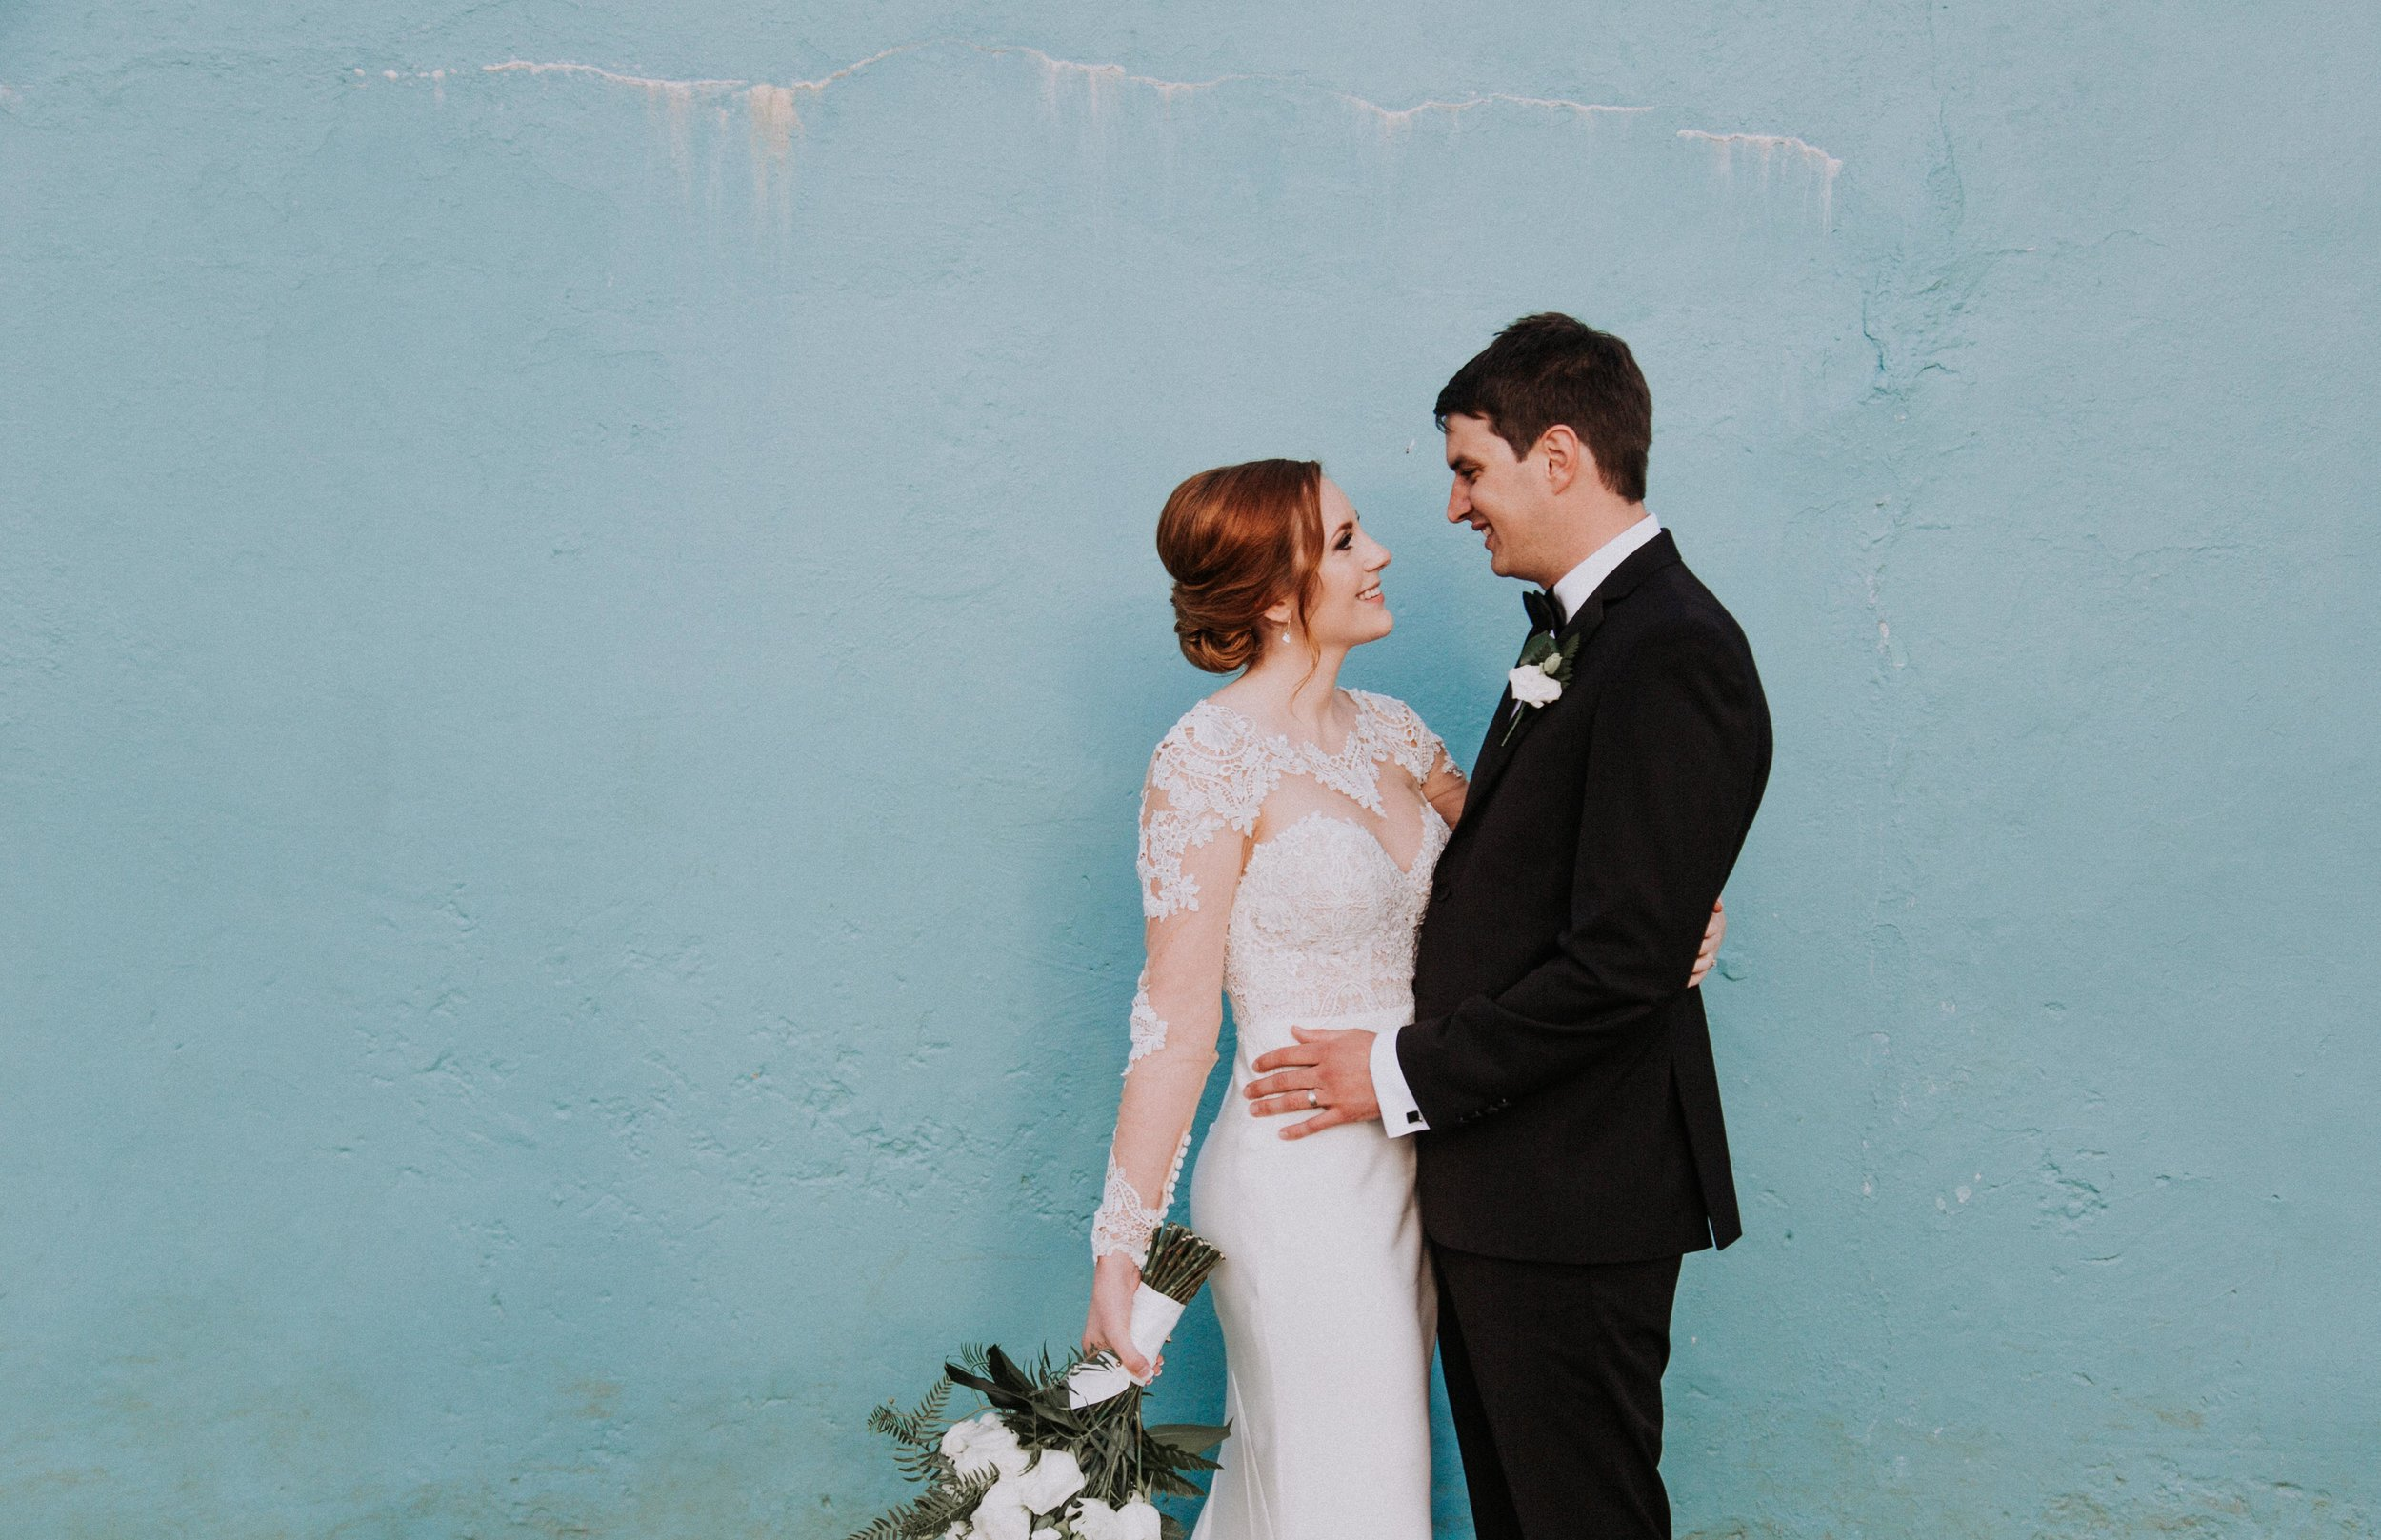 Monique + Nick Vincent - Wedding Photos FINALS-202.jpg